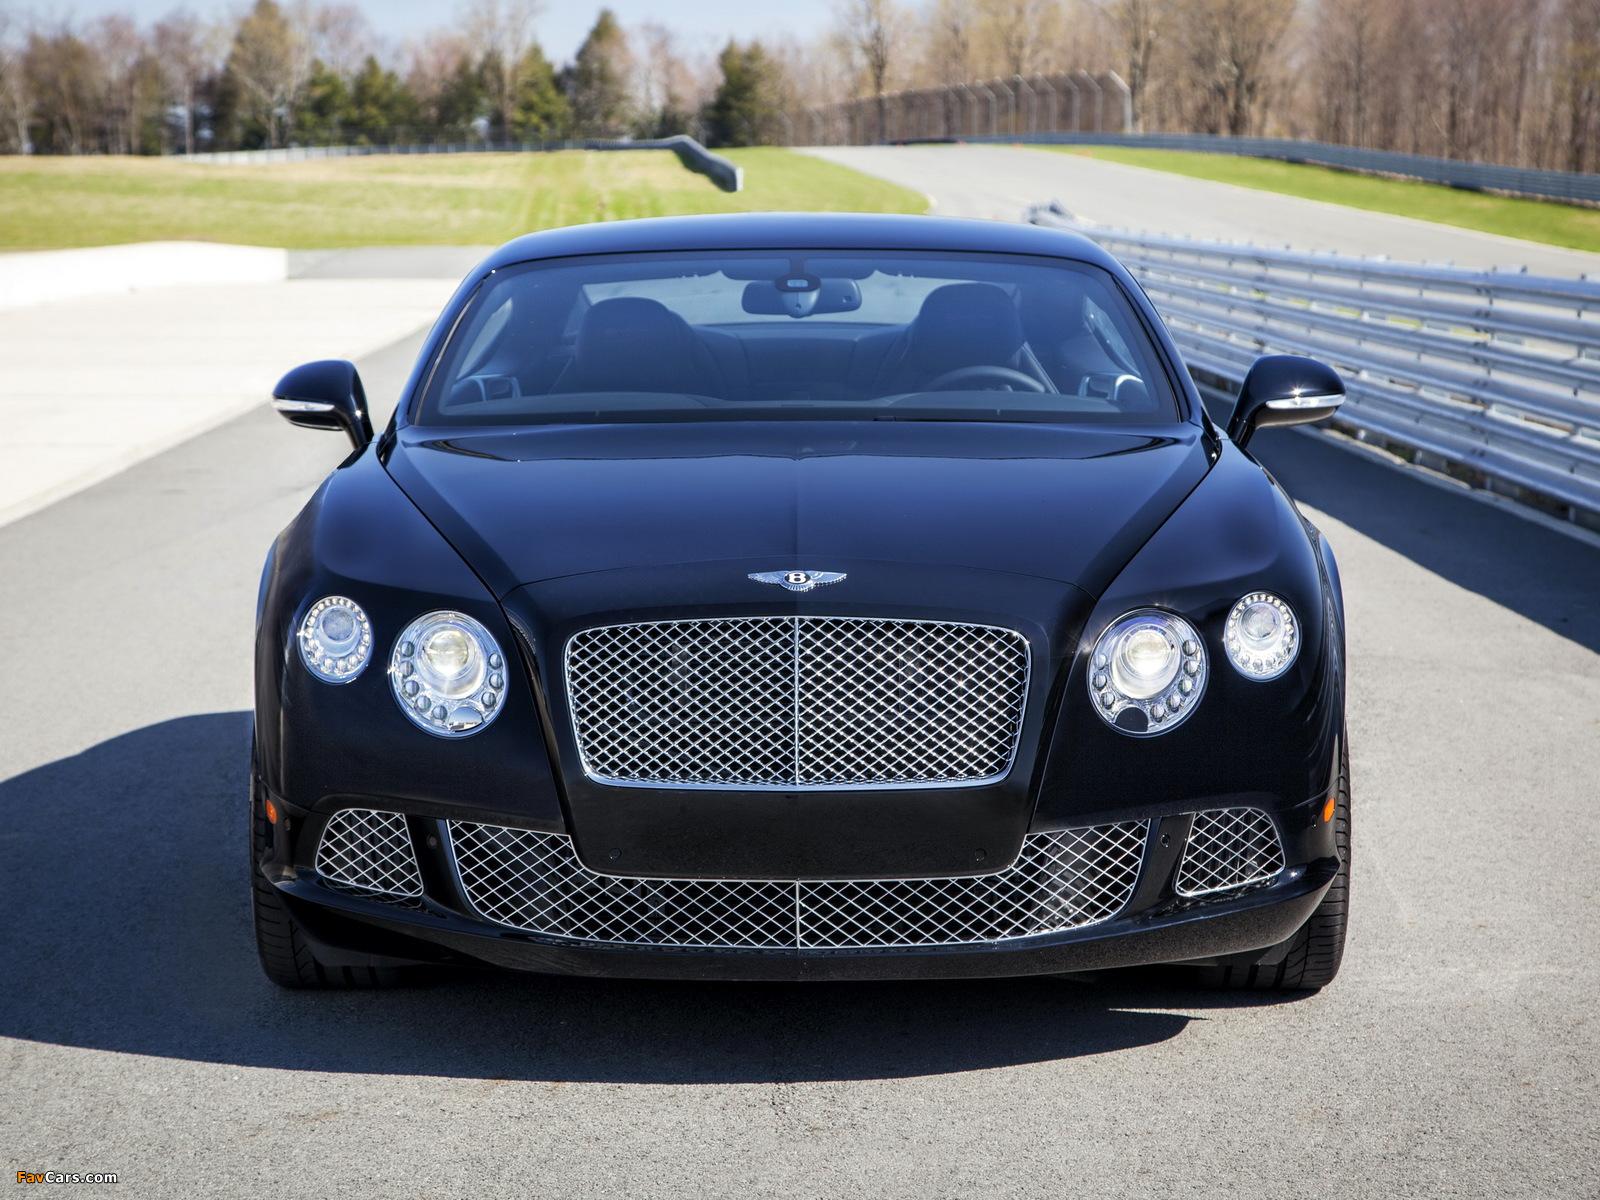 Bentley Continental GT Speed Le Mans Edition 2013 photos (1600 x 1200)